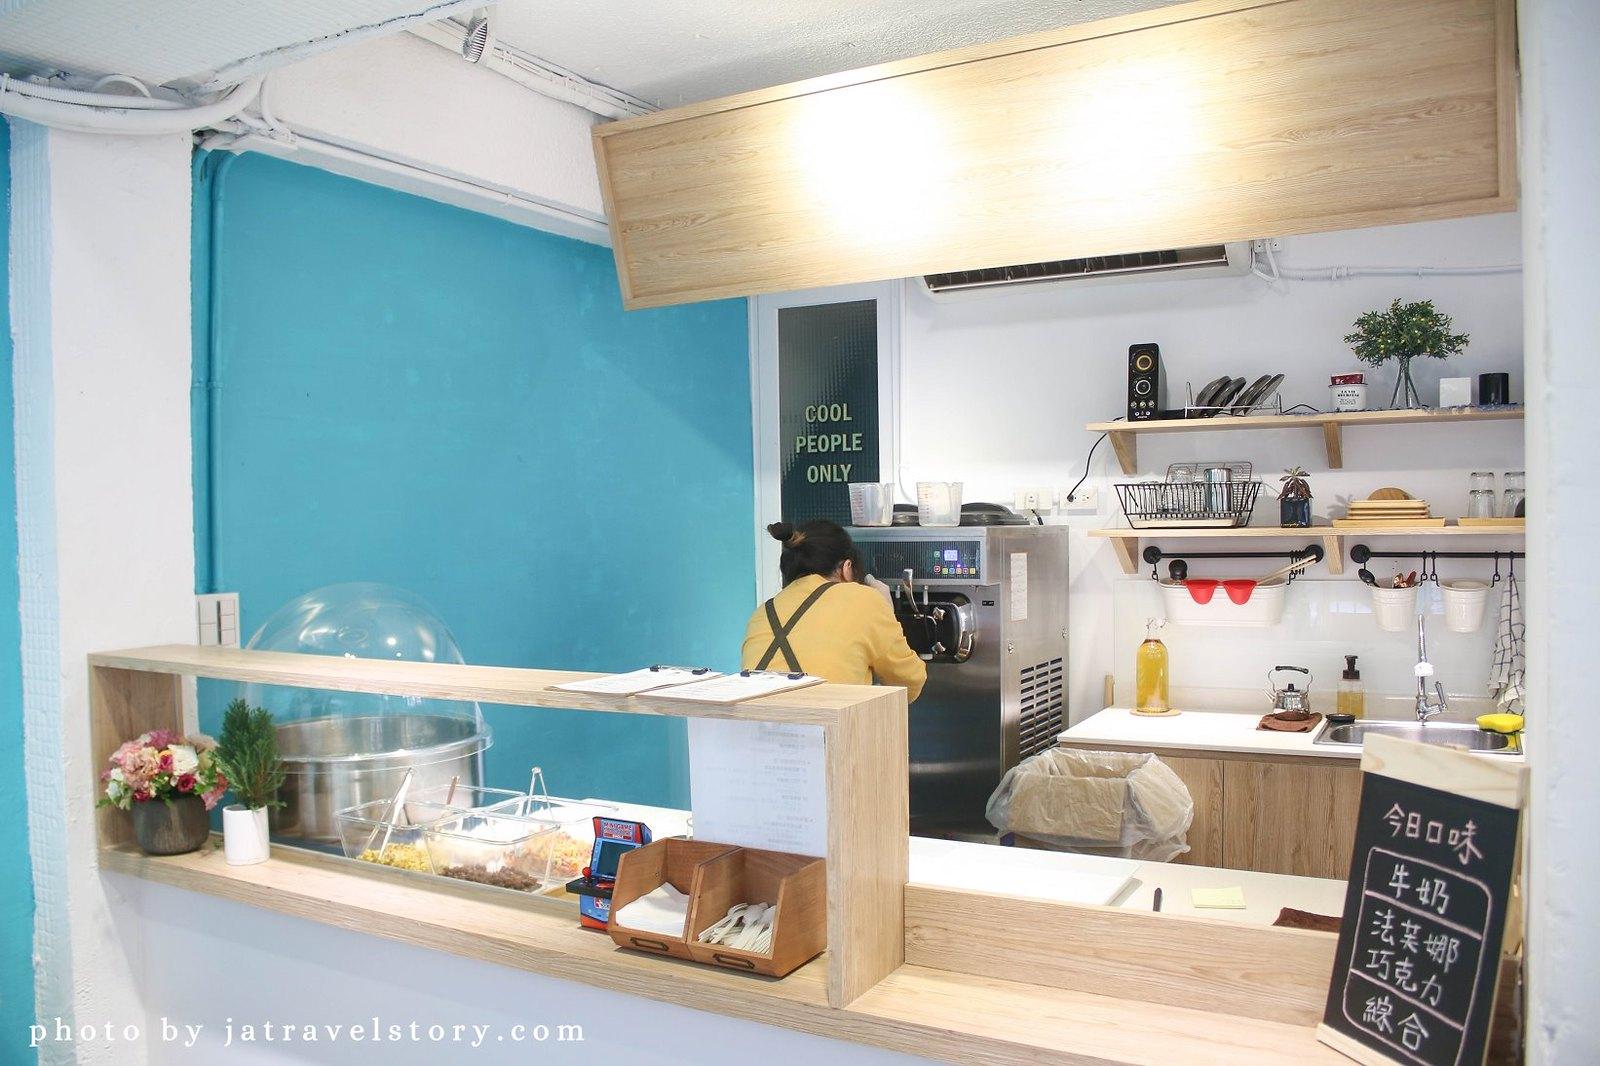 BaBu Ice cream 巴布手作霜淇淋 新開幕清新霜淇淋店!【捷運公館】公館美食/台大美食 @J&A的旅行